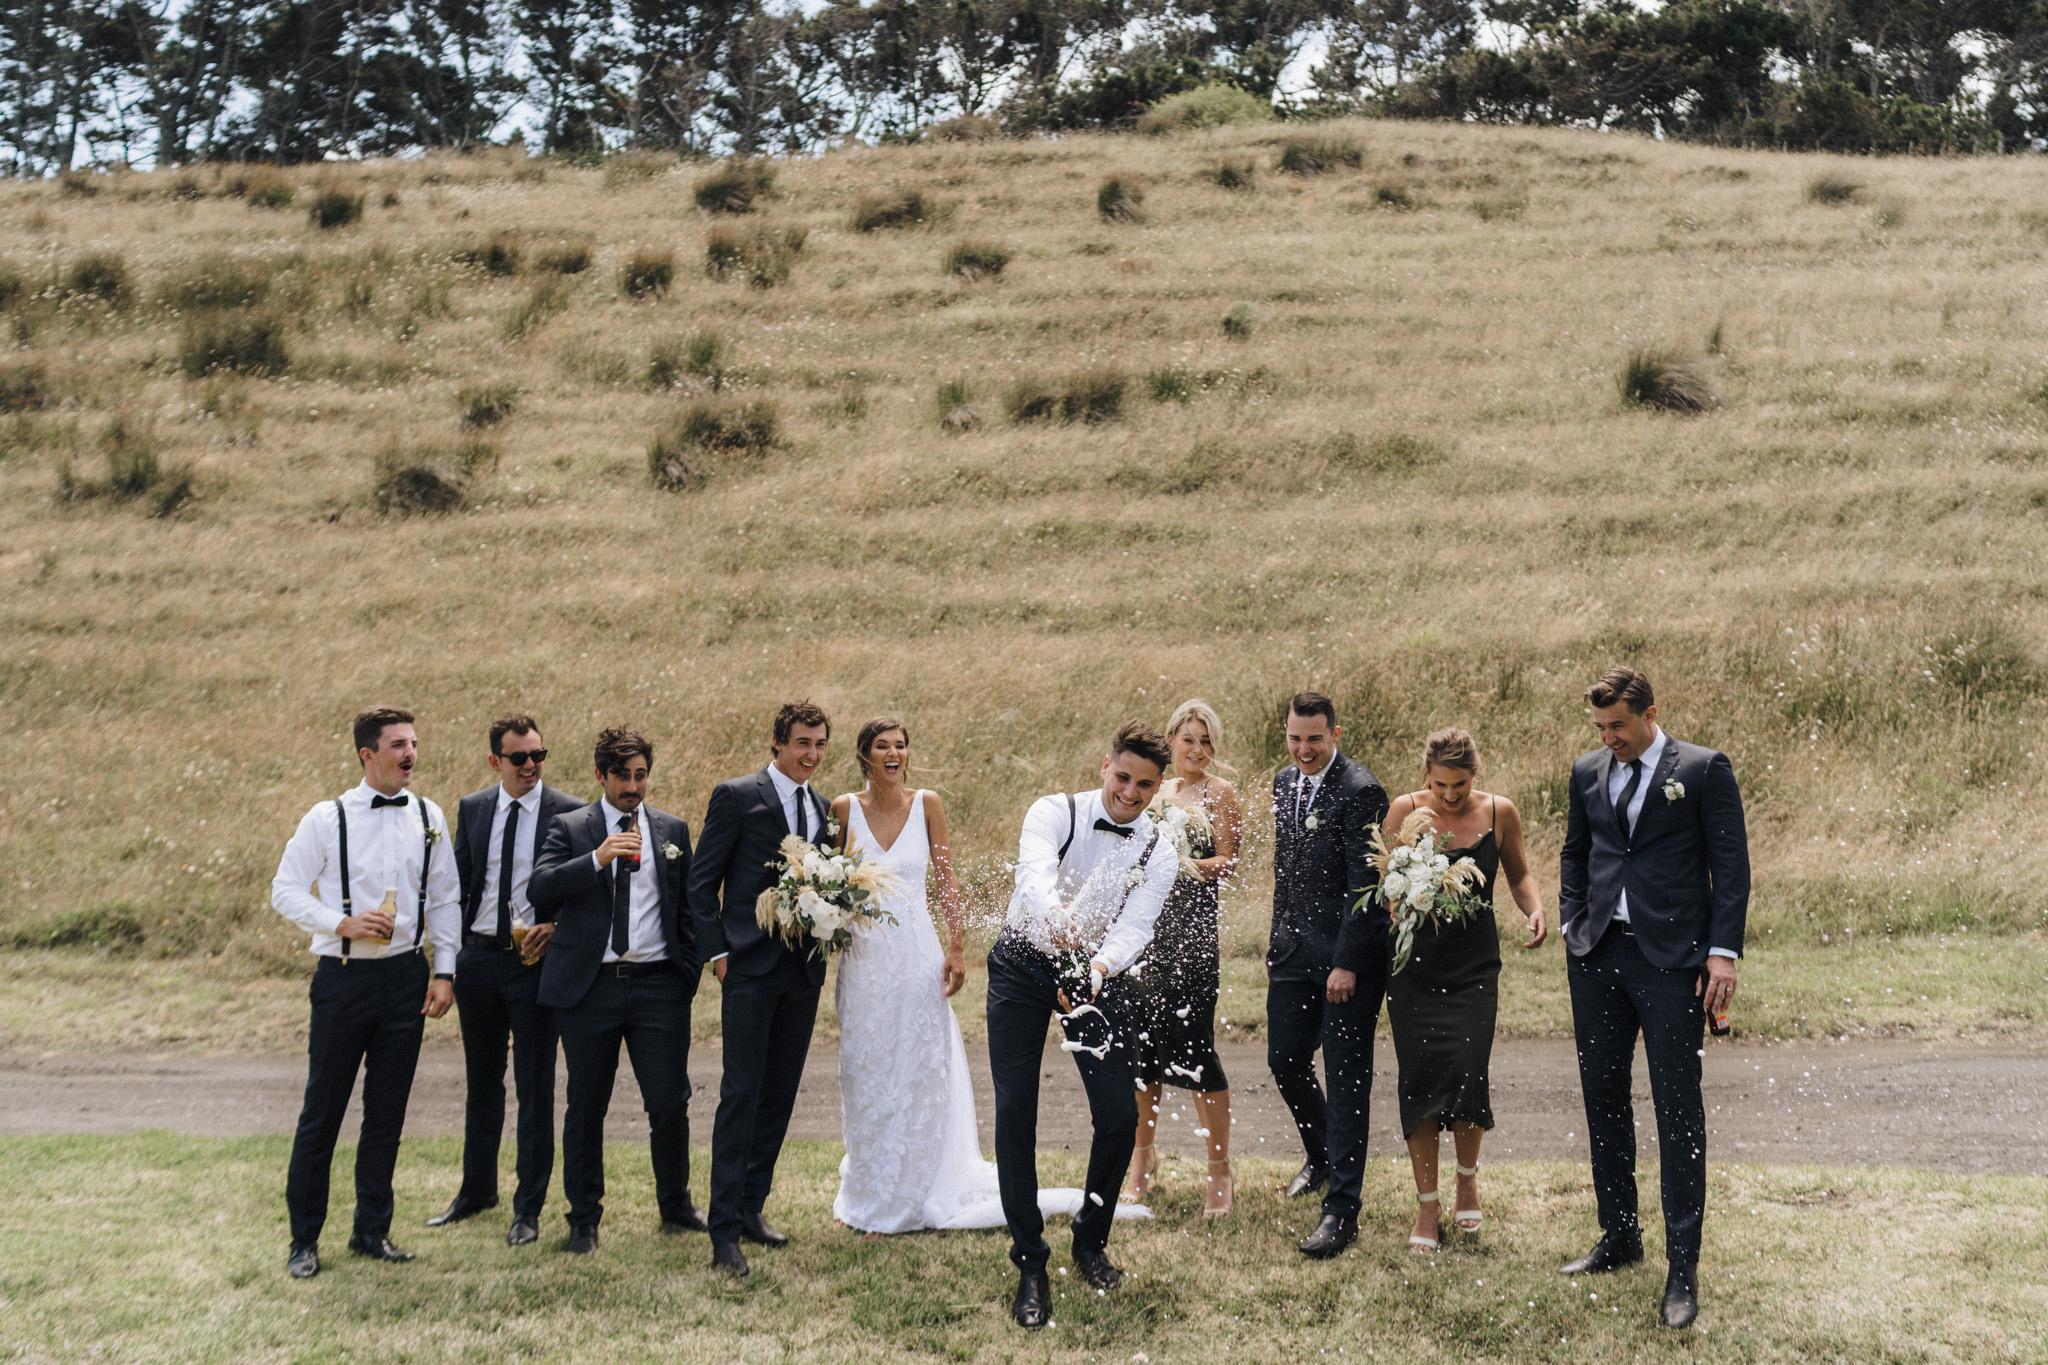 newfound-h-m-castaways-waiuku-auckland-wedding-photographer-56